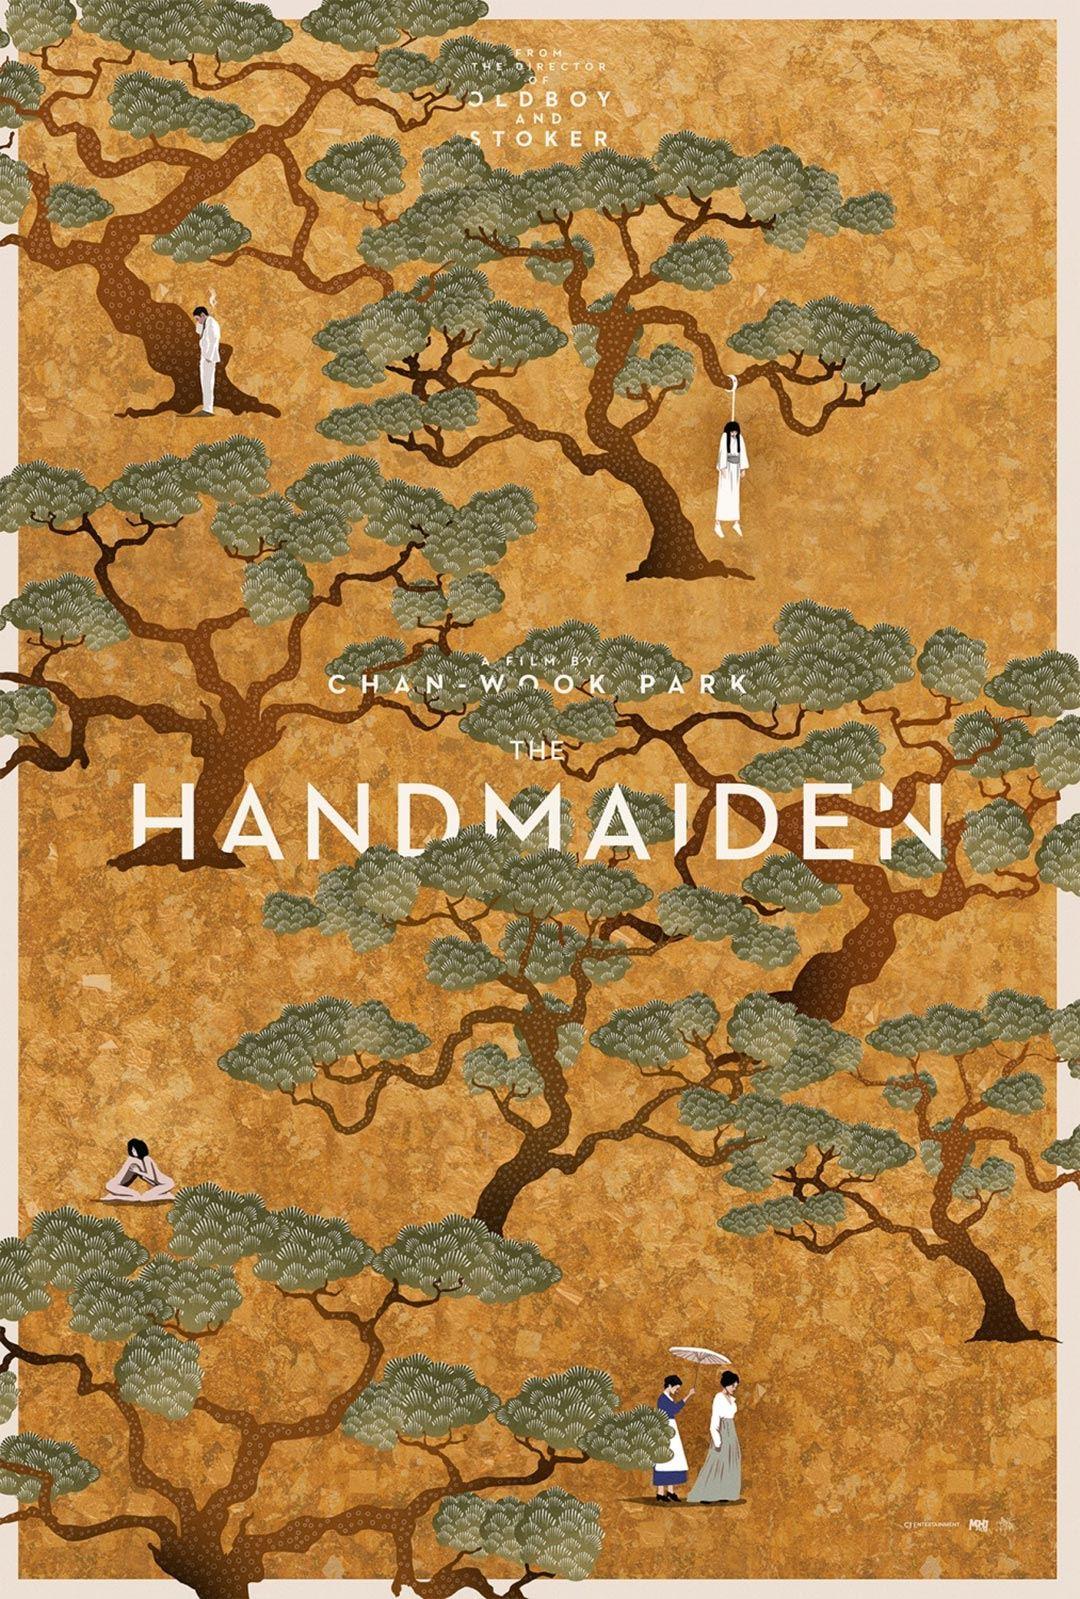 © NonStop Entertainment, Bio: The Handmaiden